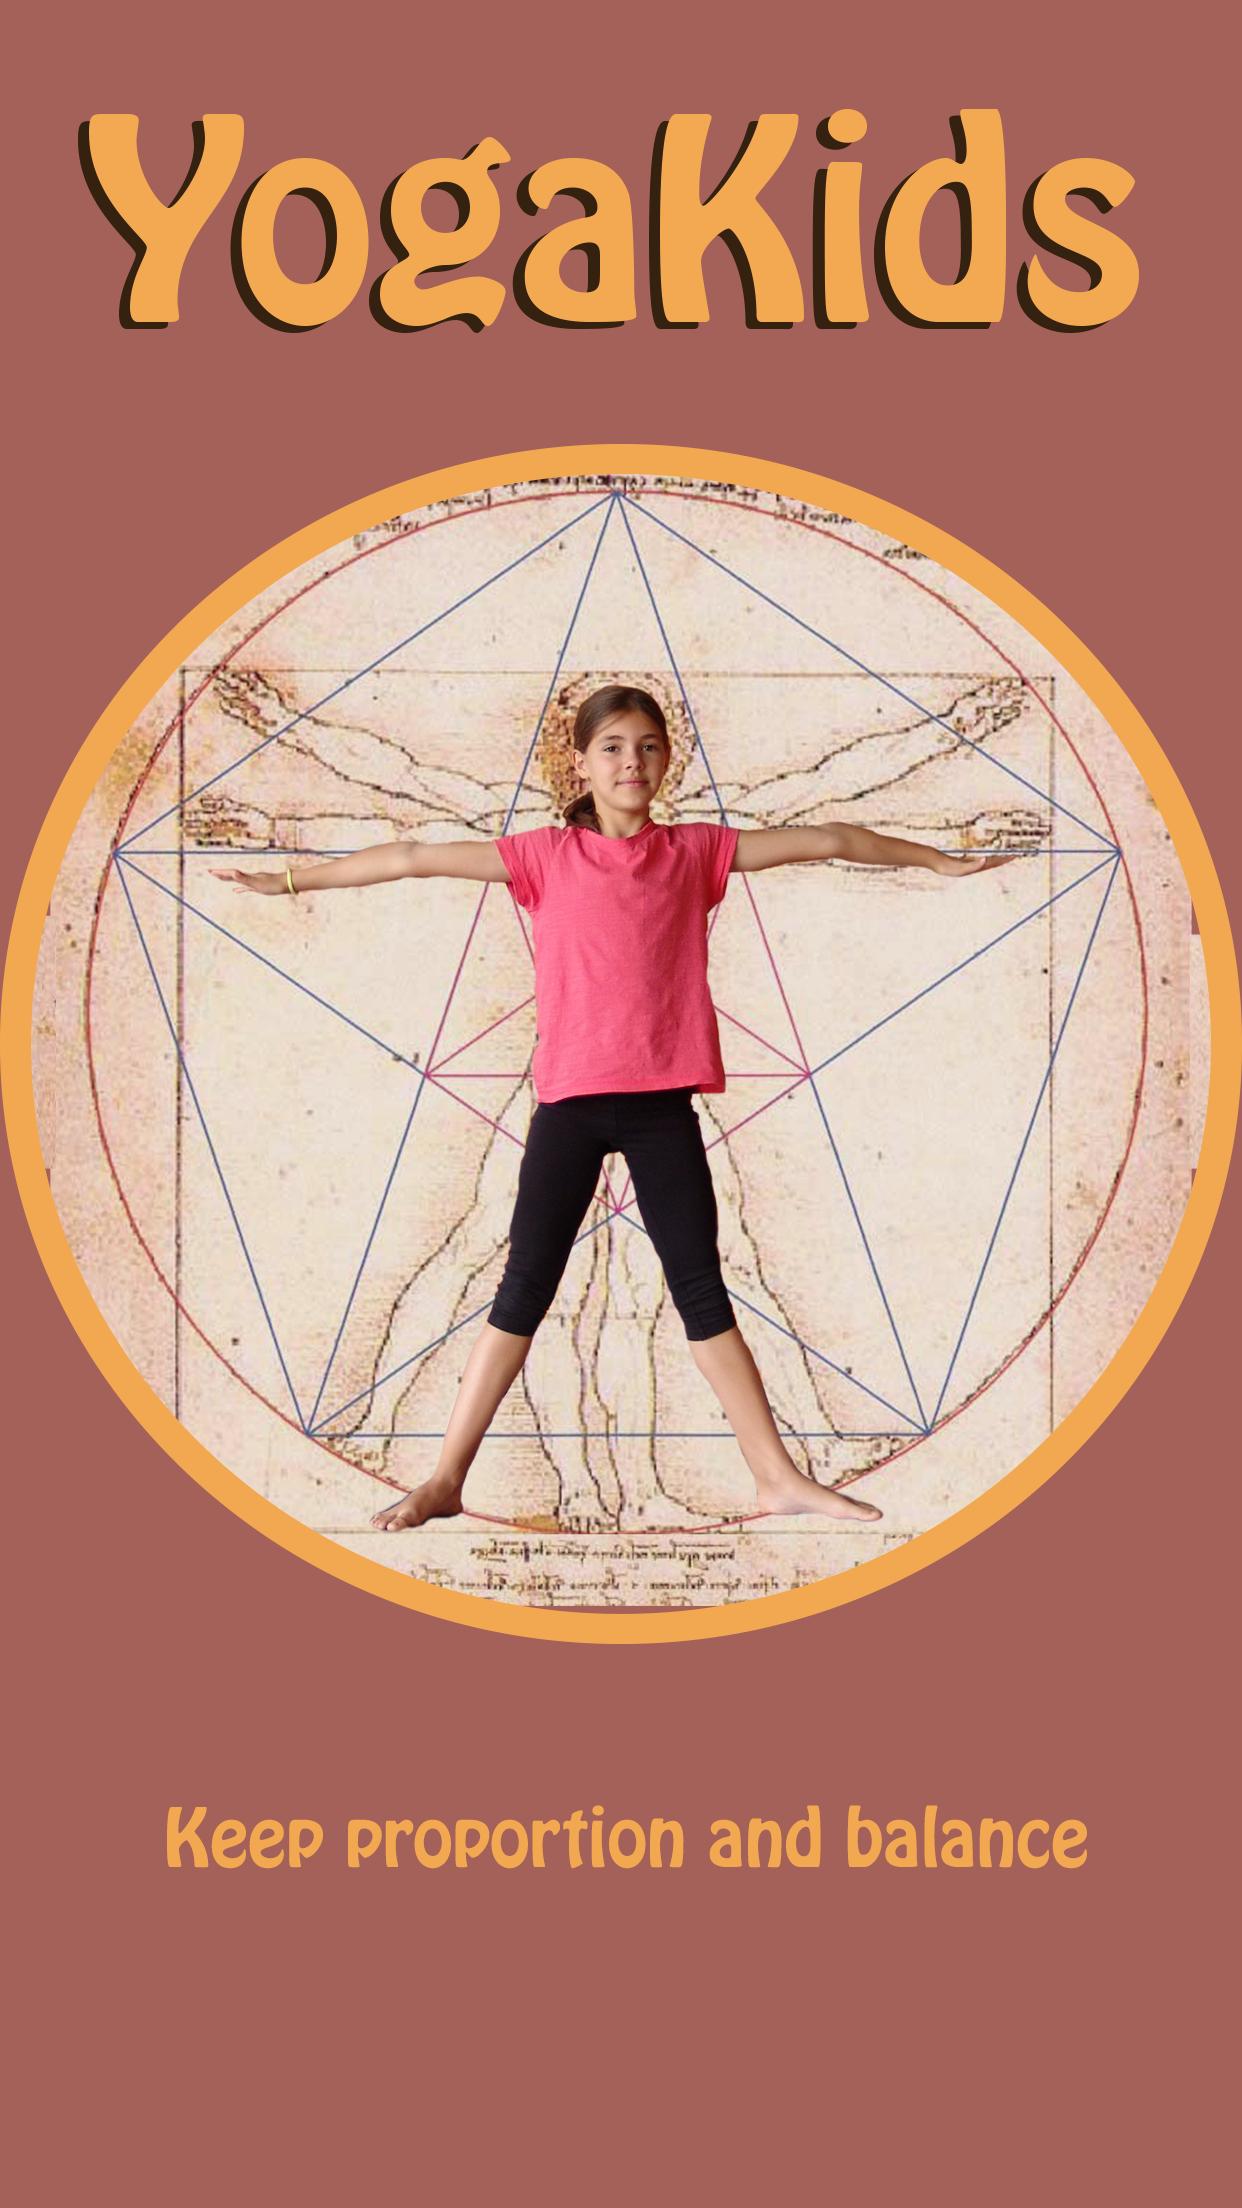 YogaKids+balance